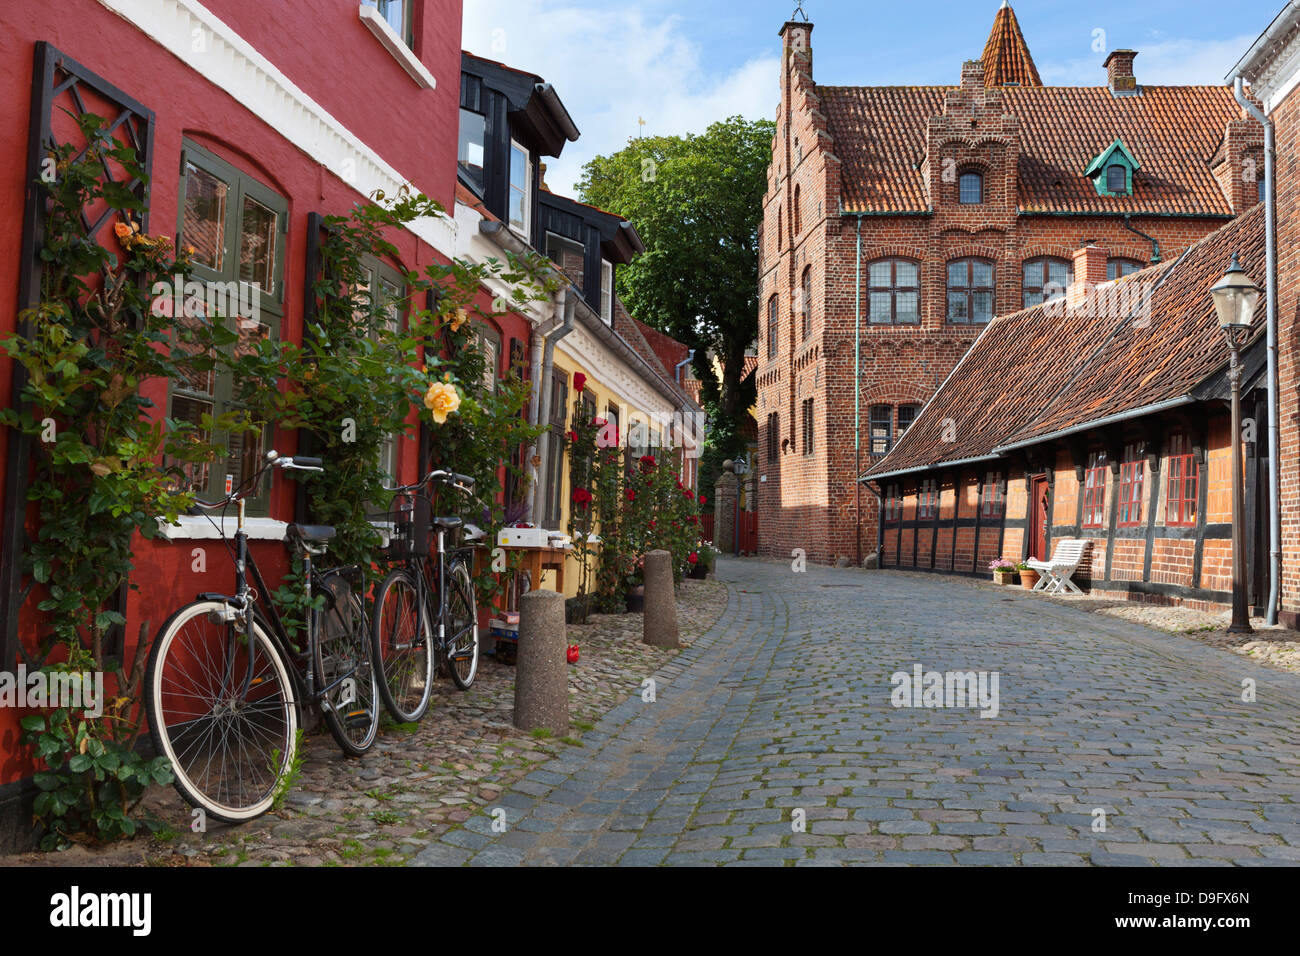 Cobblestone alley in the old town, Ribe, Jutland, Denmark, Scandinavia - Stock Image